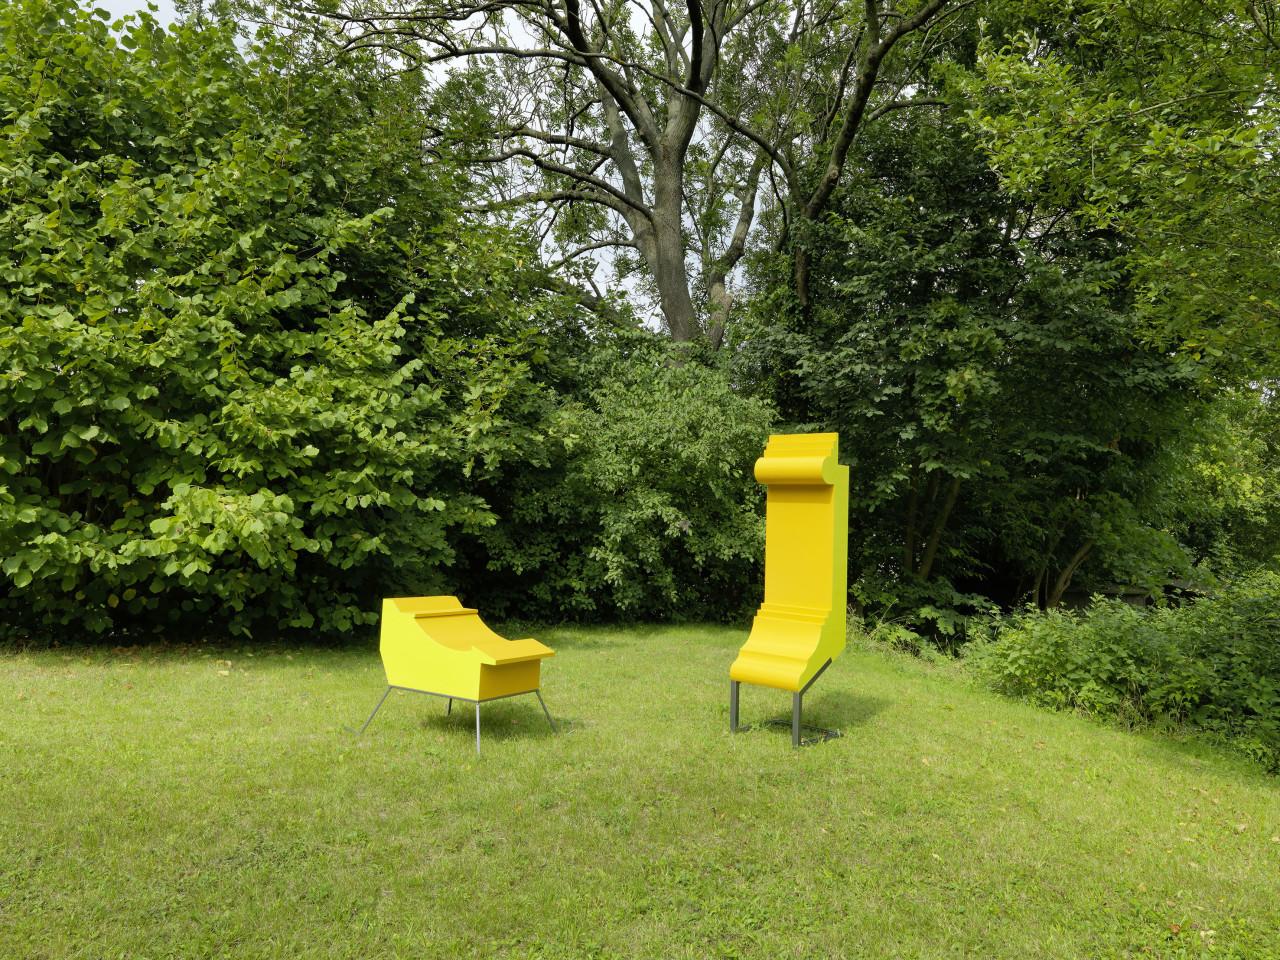 Sculpture Garden, Installation view: Jay Gard, 2019